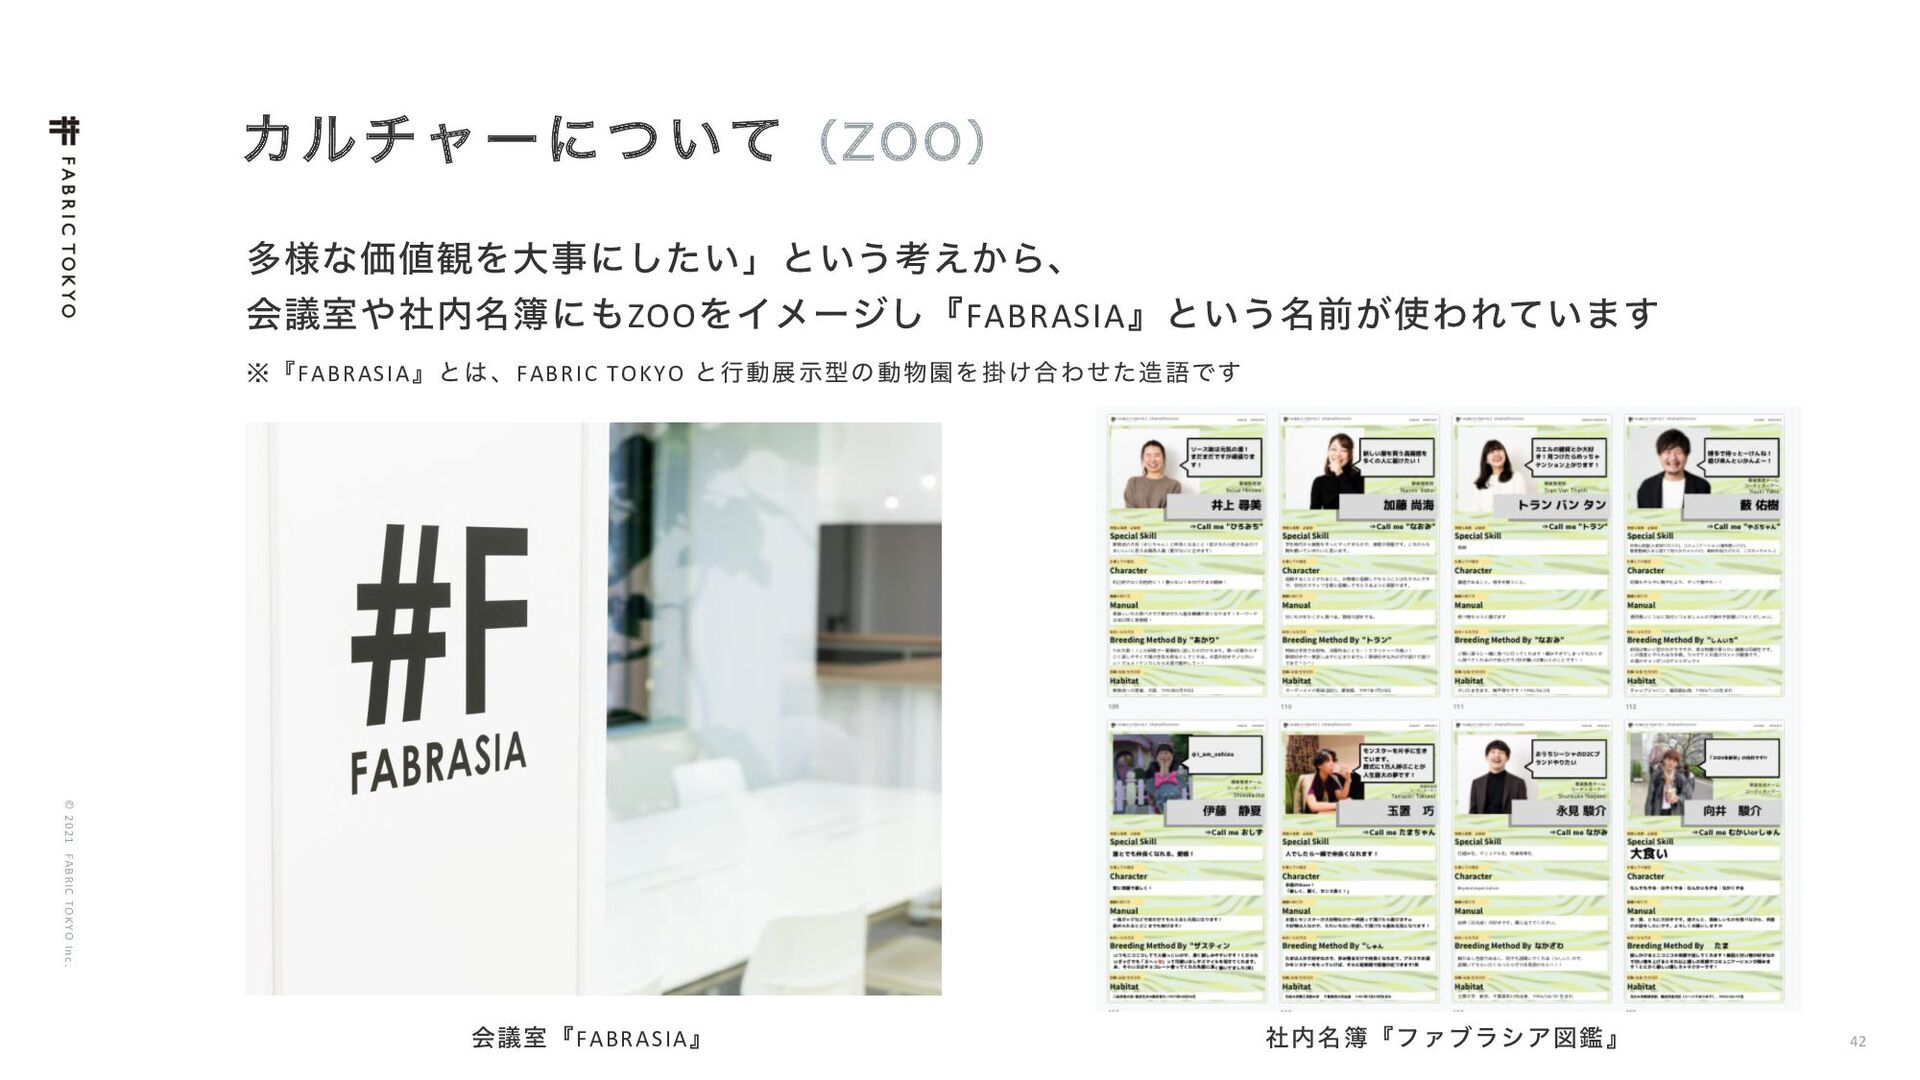 © 2021 FABRIC TOKYO Inc. 42 Χϧνϟʔʹ͍ͭͯʢ53:ʣ ೖࣾޙɺ...